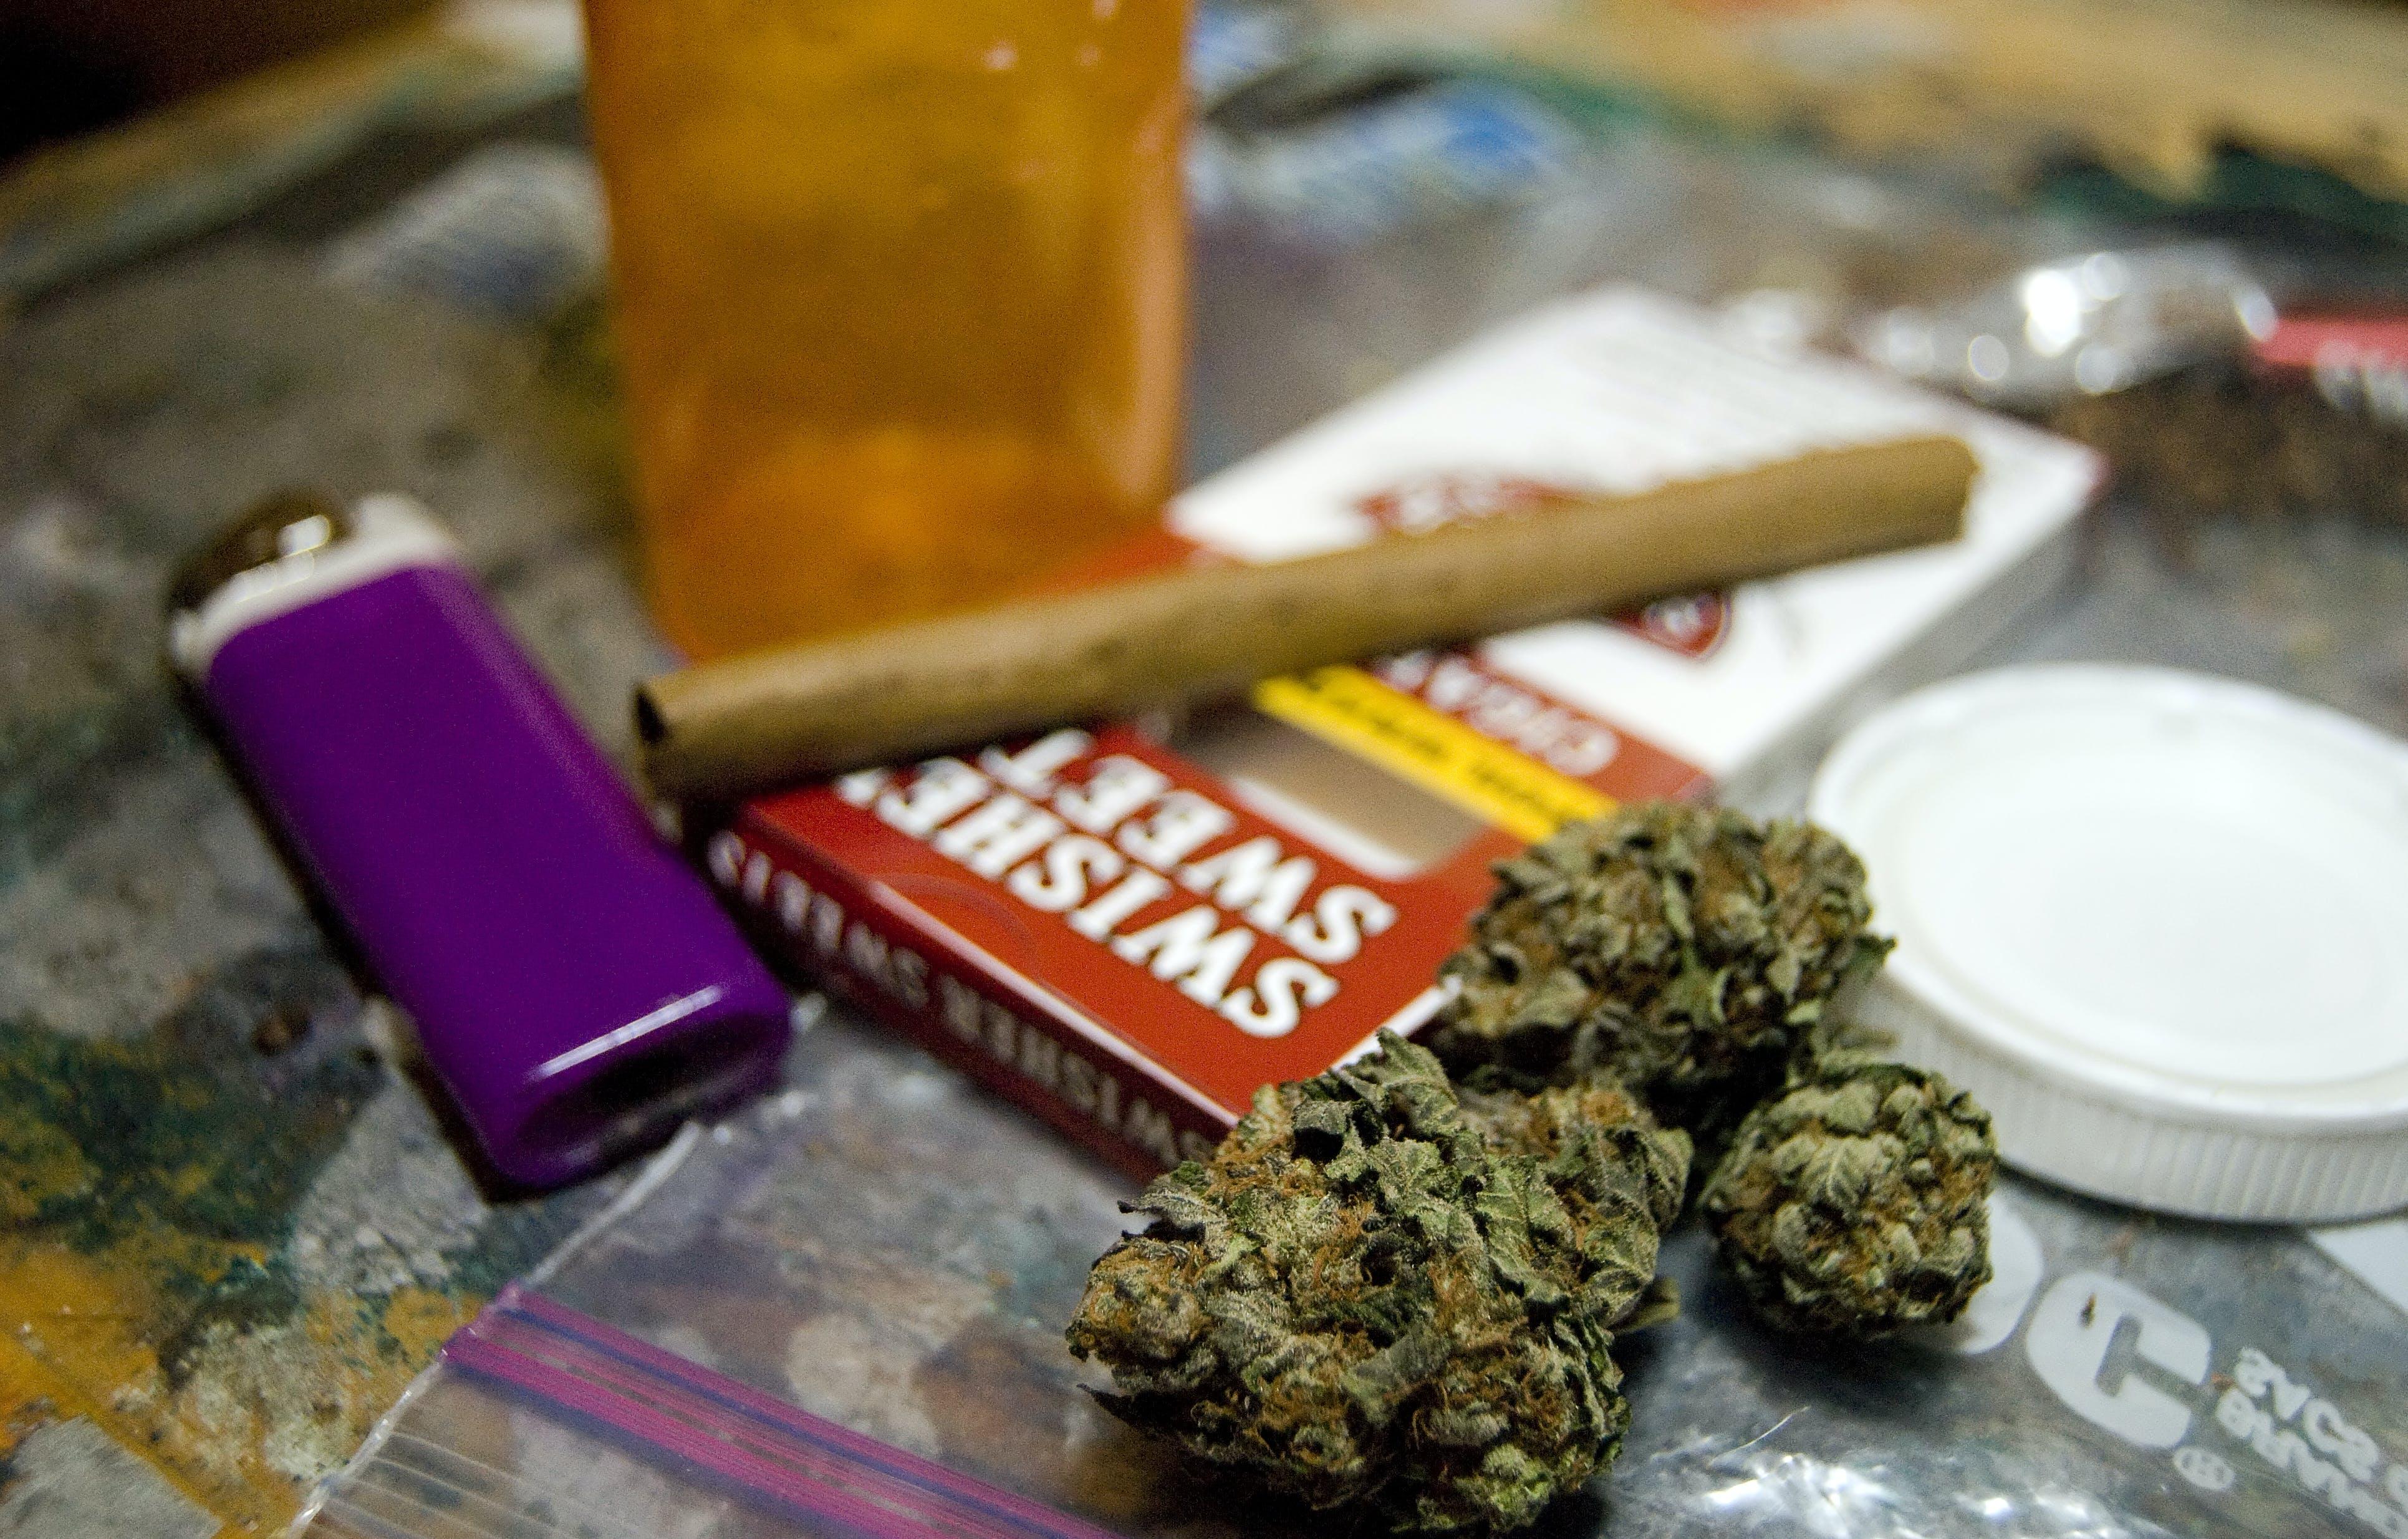 5342392874 d5e69e7df9 o Jeff Sessions finally says marijuana may have some benefits